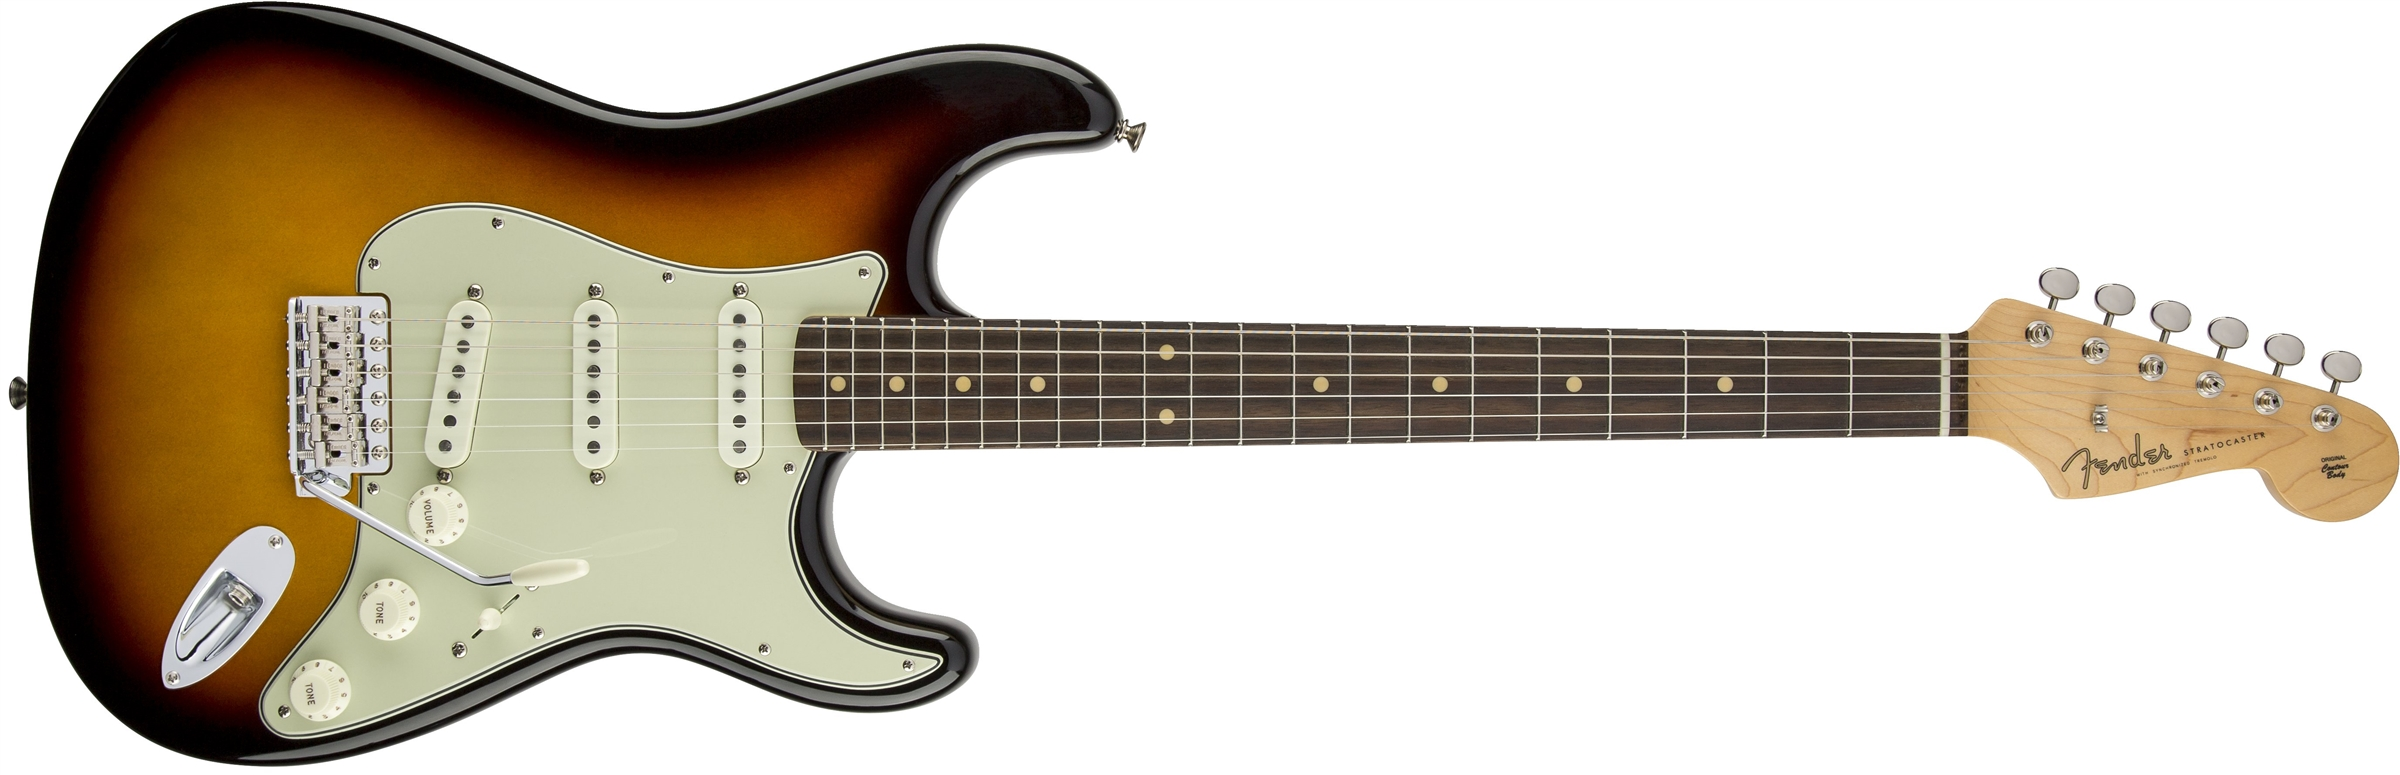 Fender Squier Affinity Series Mini Stratocaster RW